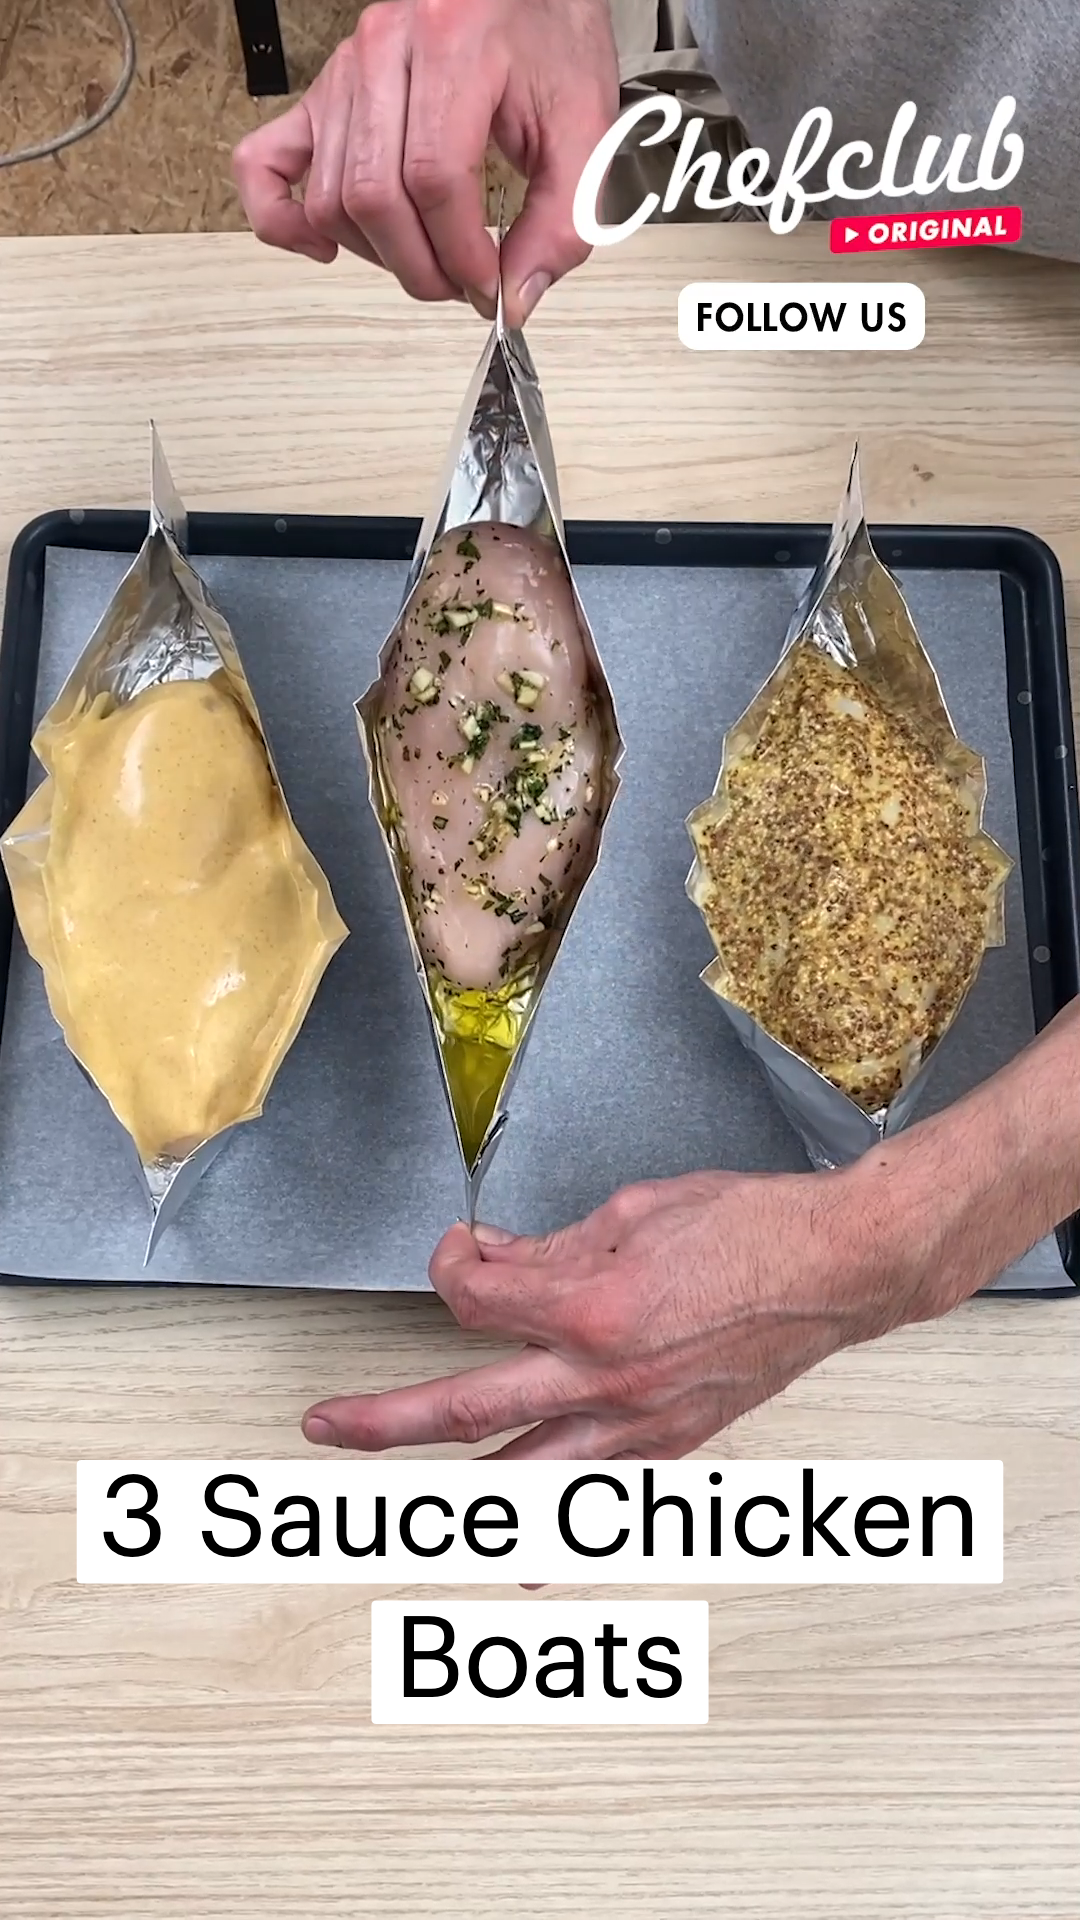 3 Sauce Chicken Boats